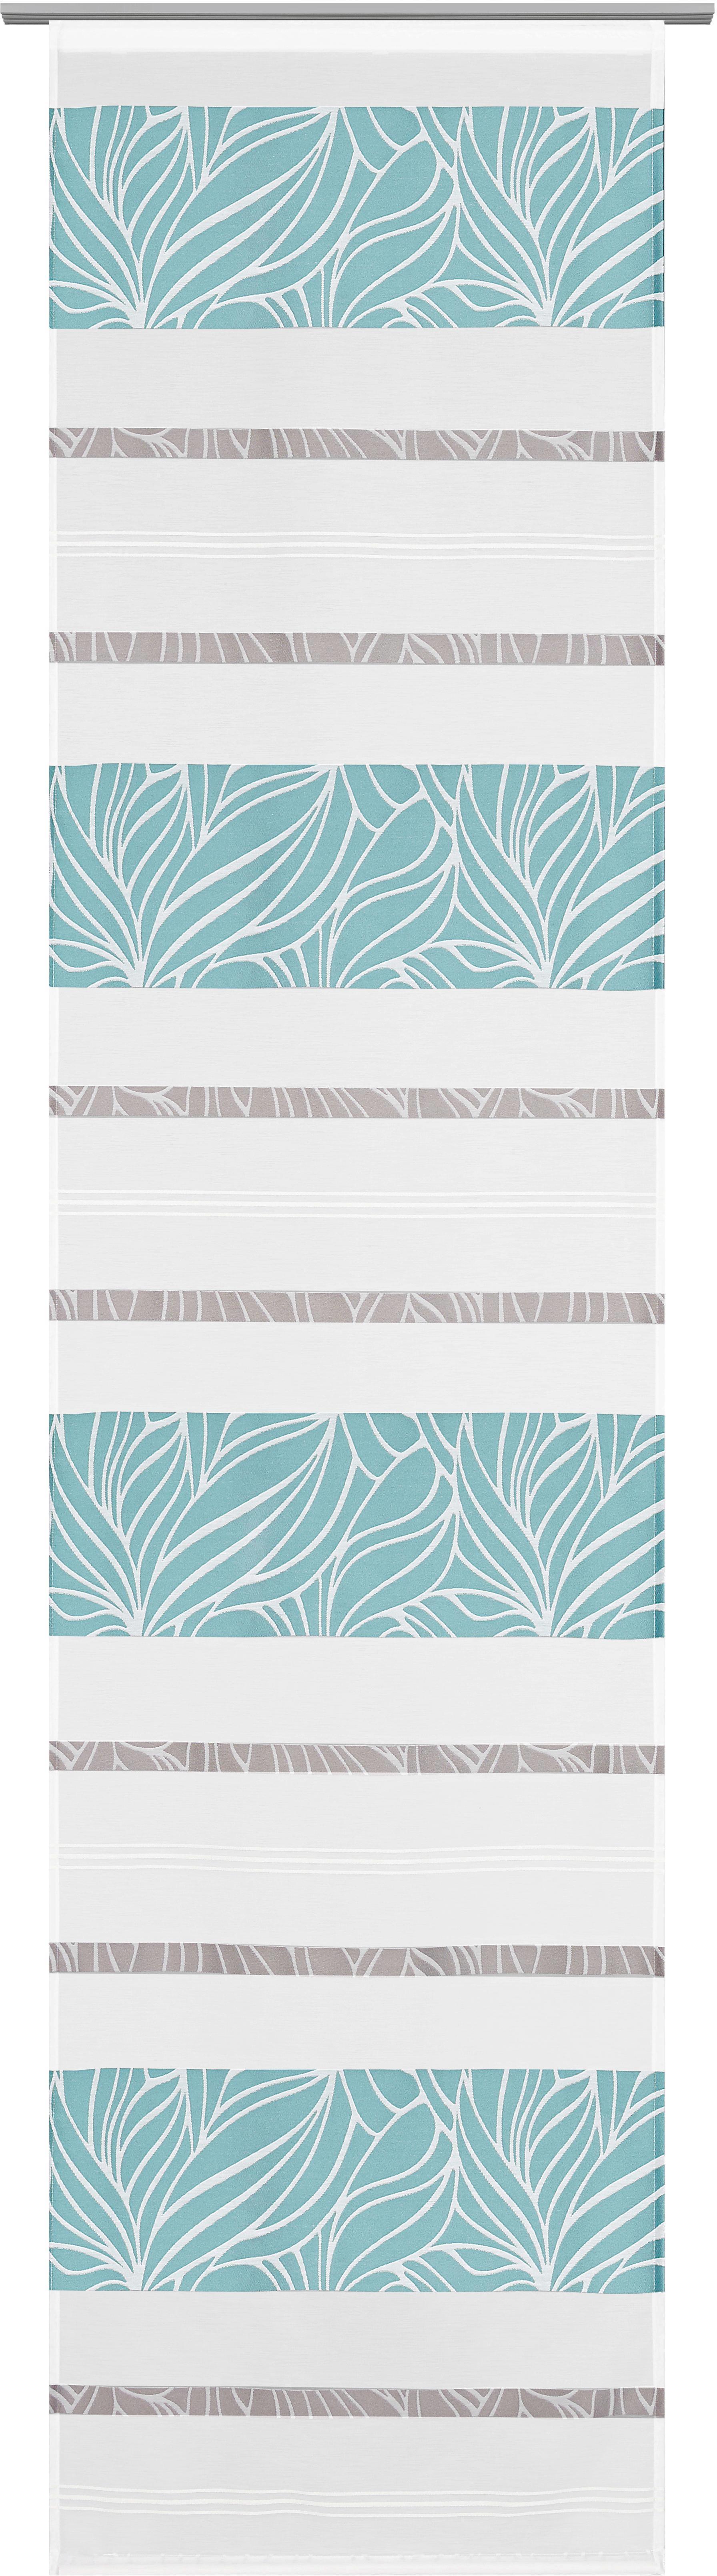 Flächenvorhang Anita, ca. 60x245cm - Blau, KONVENTIONELL, Textil (60/245cm) - MODERN LIVING